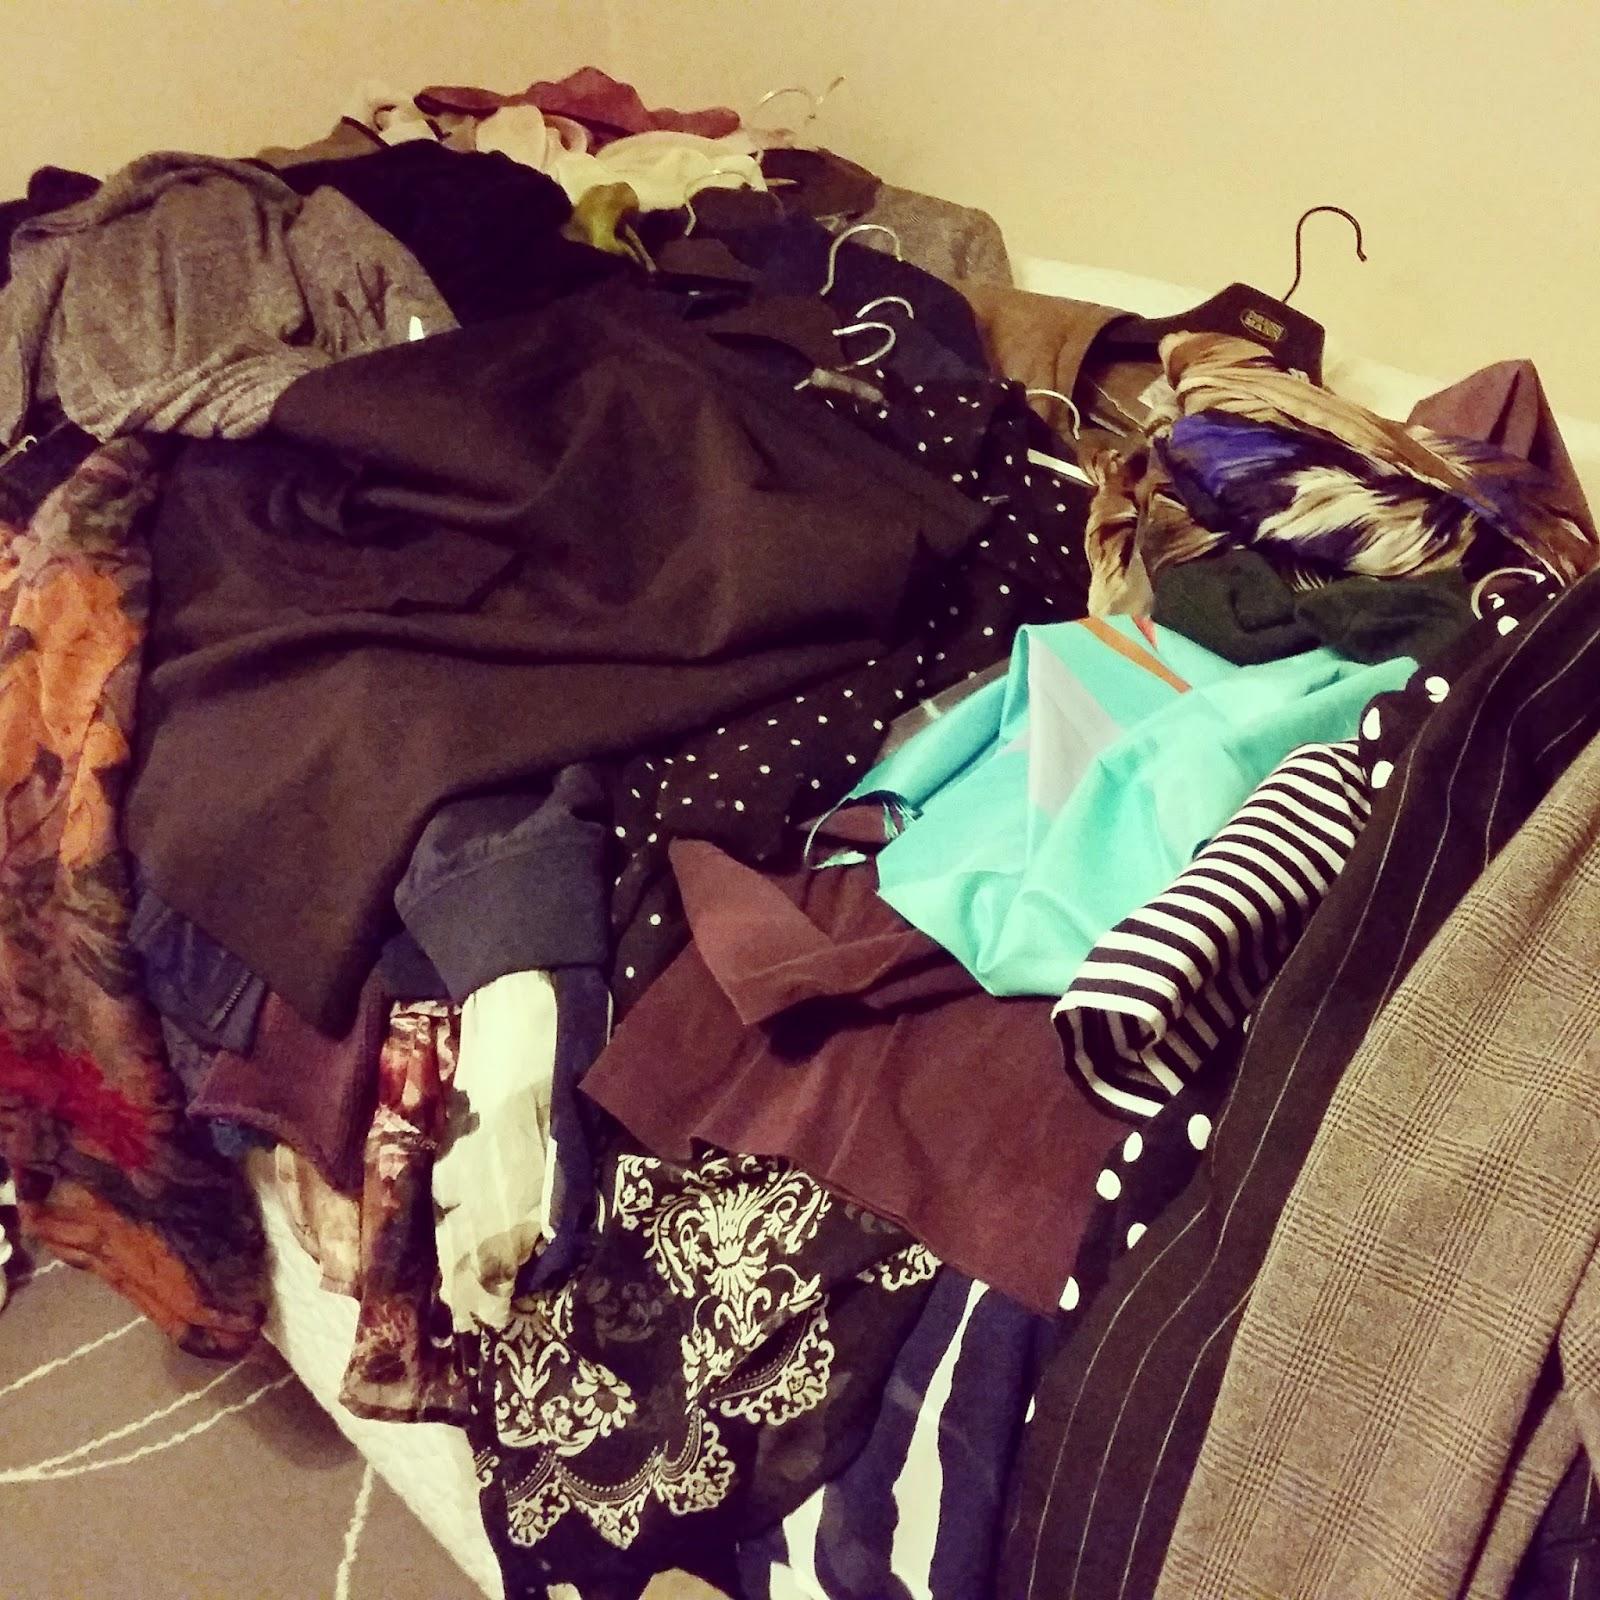 garderobsrensning